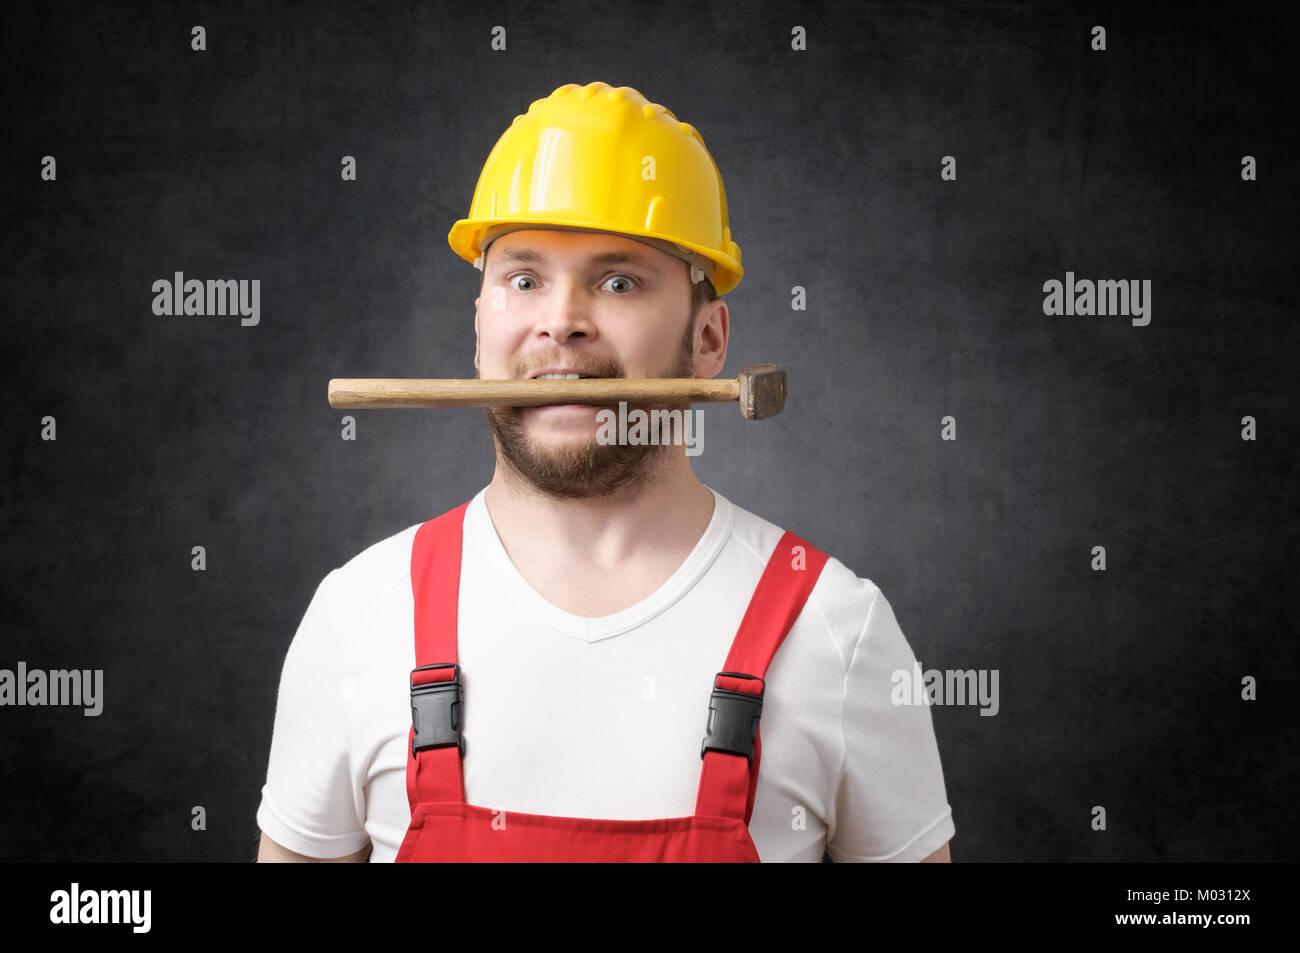 Verrückt Bauarbeiter Stockbild